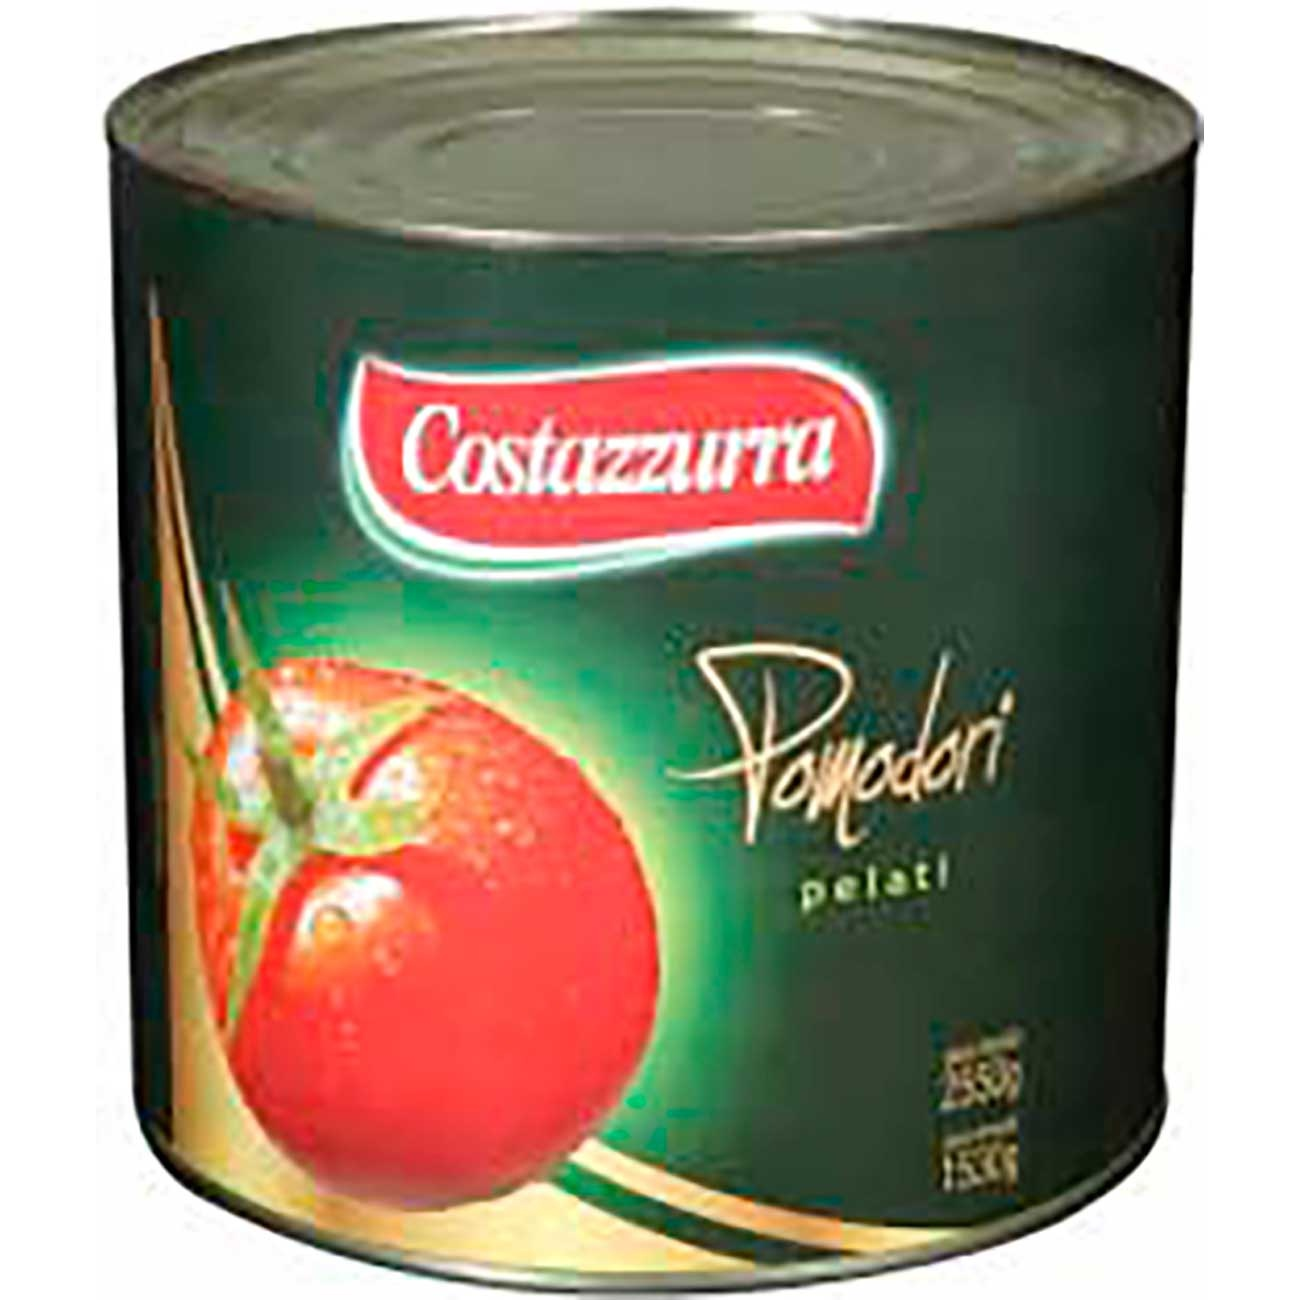 Tomate Pelado Costazzurra Pomodori 2,550kg